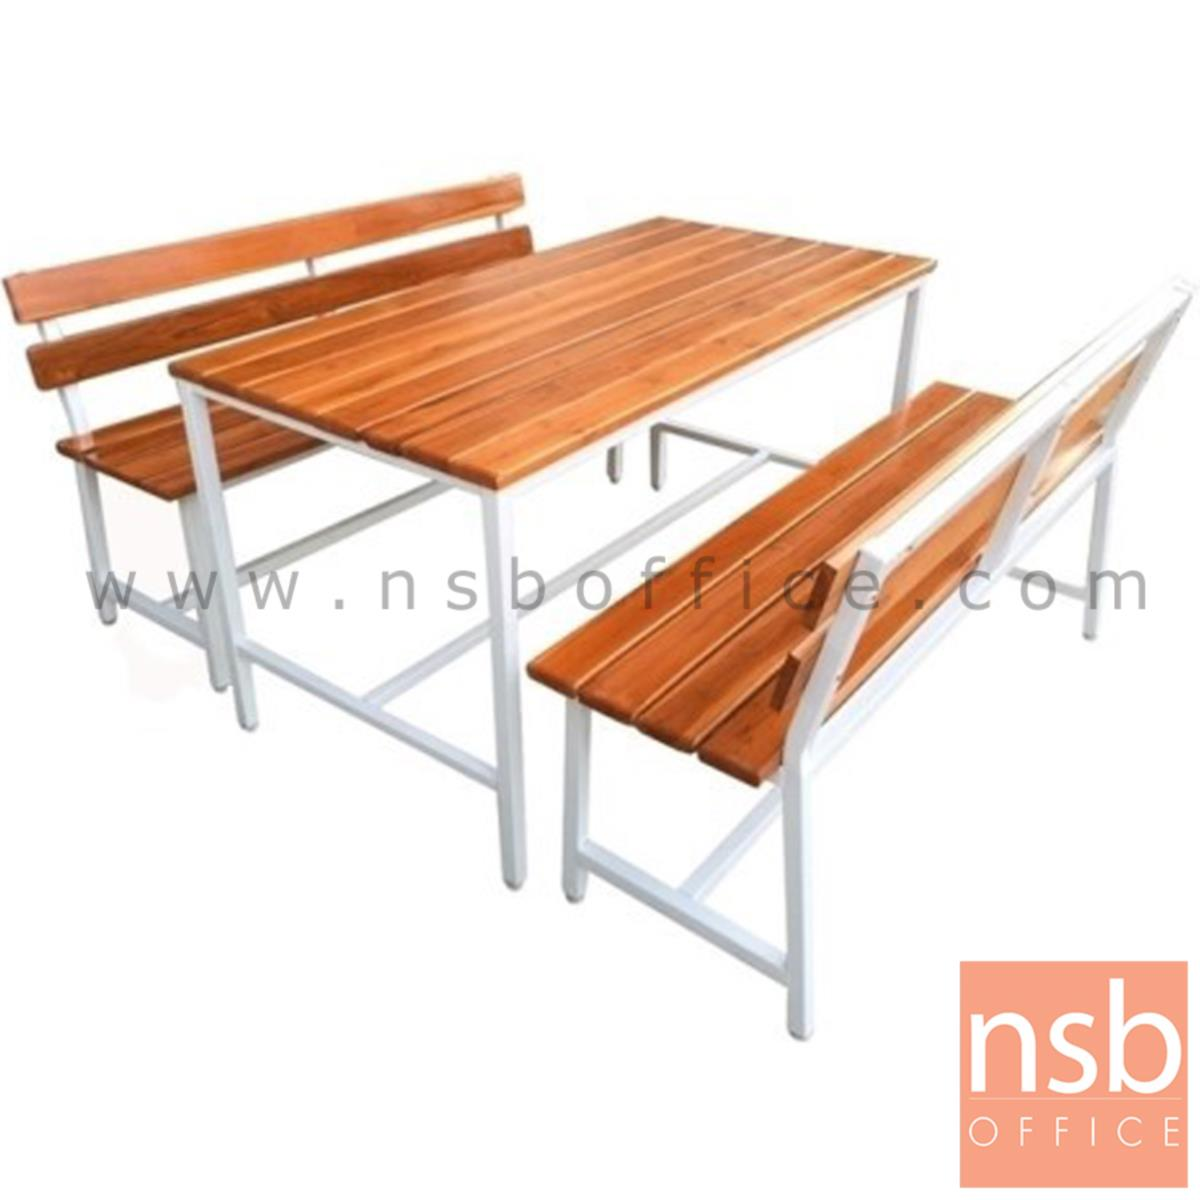 A17A084:โต๊ะโรงอาหารไม้สักตีระแนงชิด รุ่น TENNESSEE (เทนเนสซี) ขนาด 150W cm. ขาเหล็ก